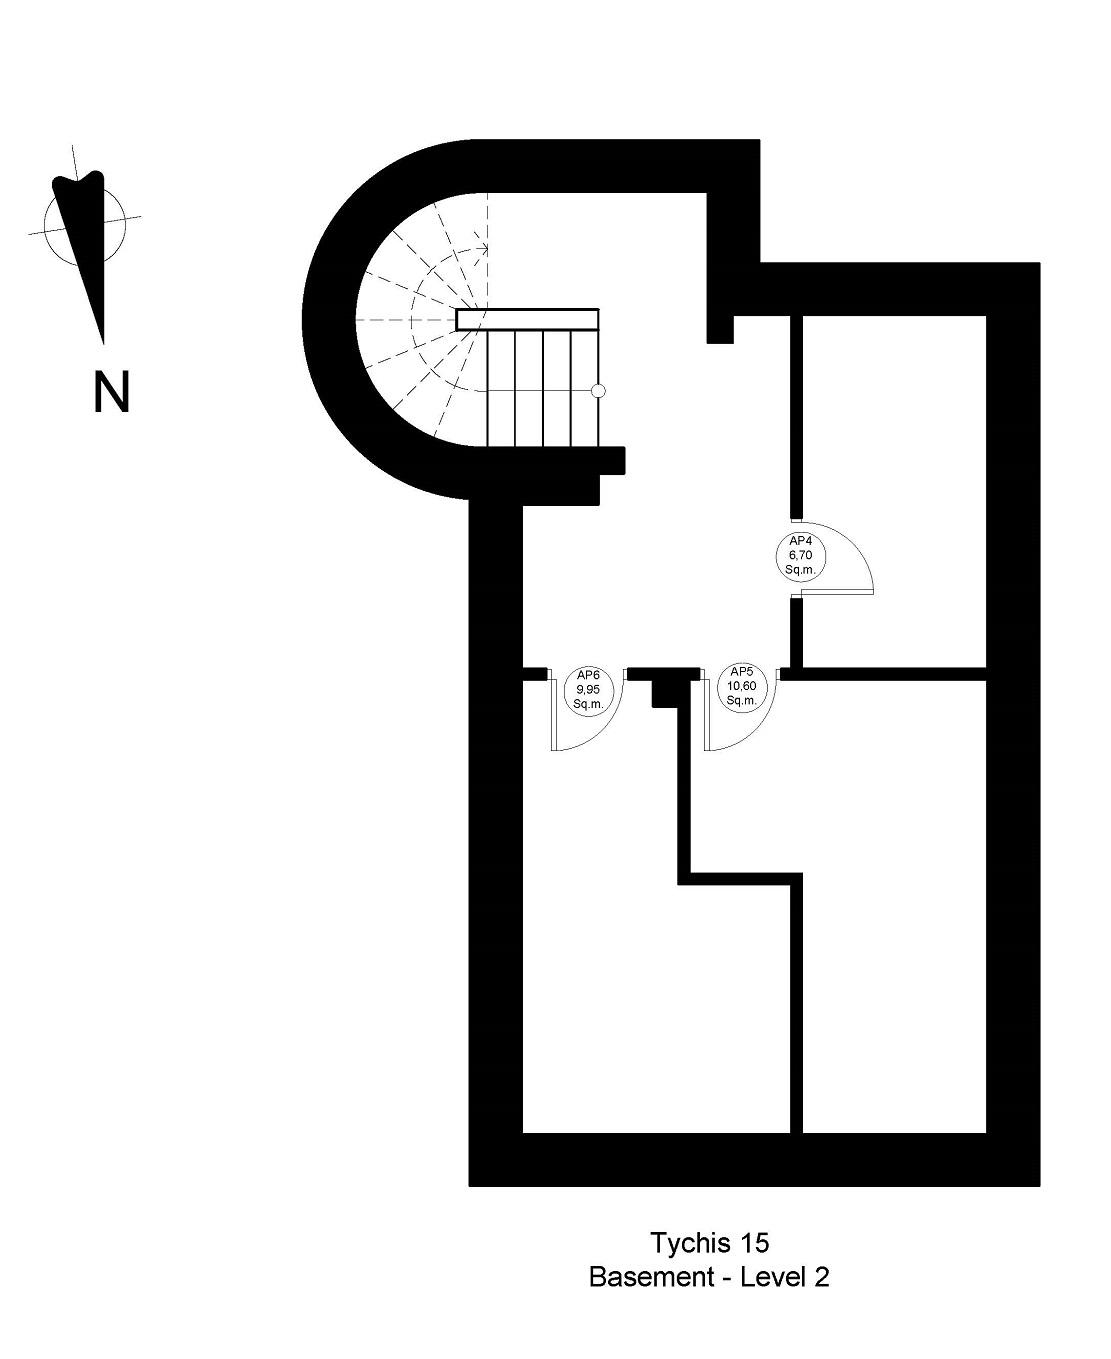 Tichis 15 2nd basement plan